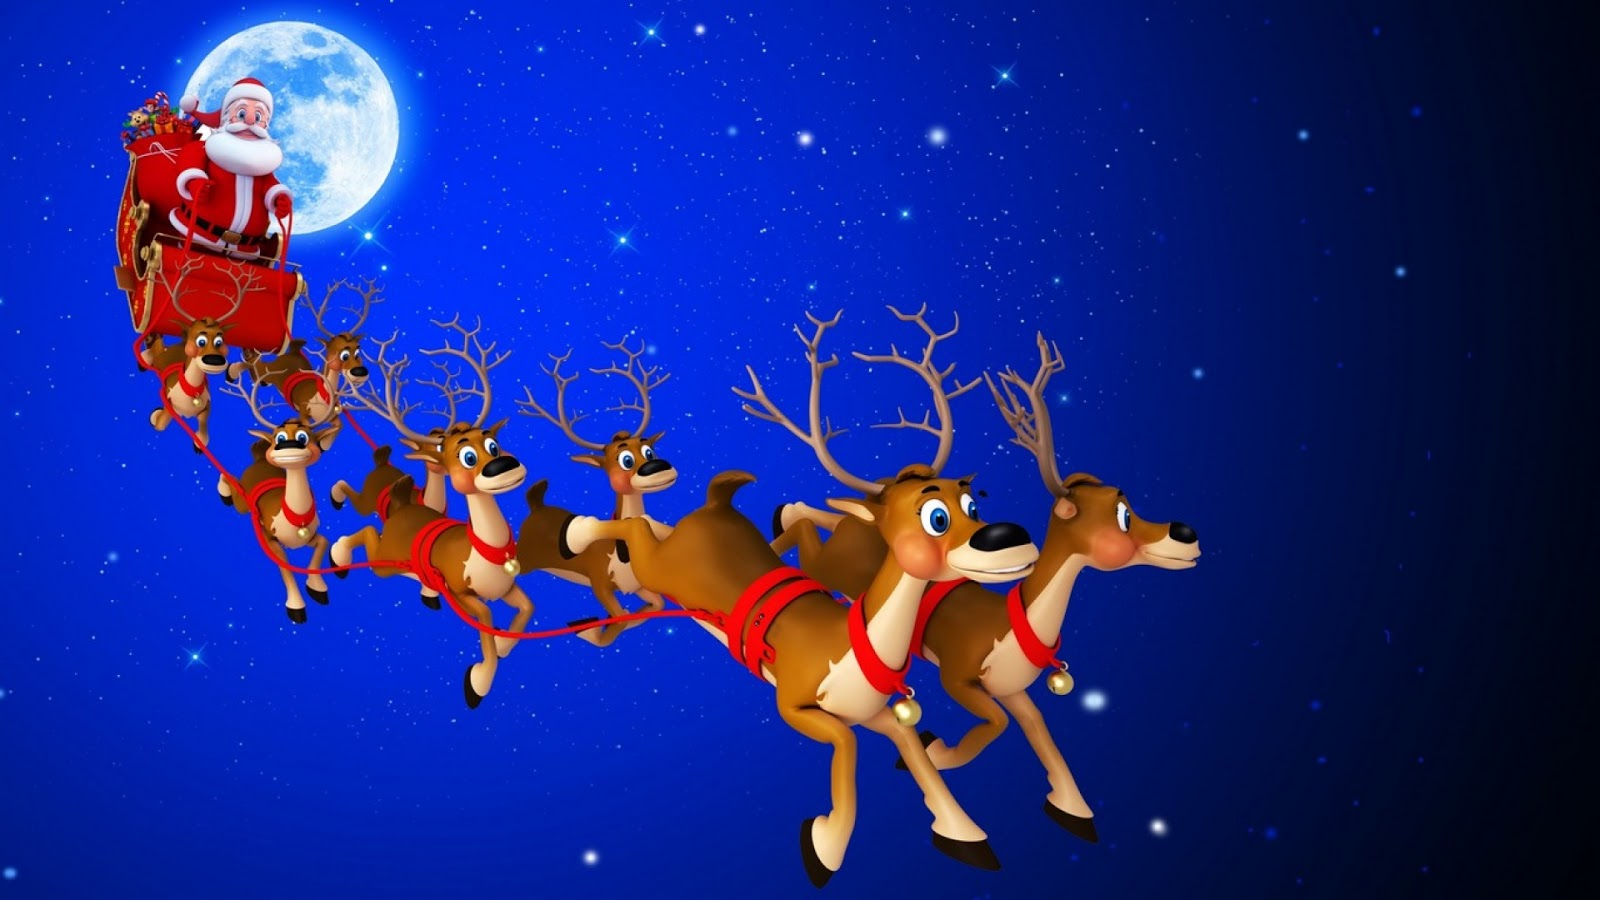 Santa Claus with Gift Wallpaper - WallpapersXplore | Free ...